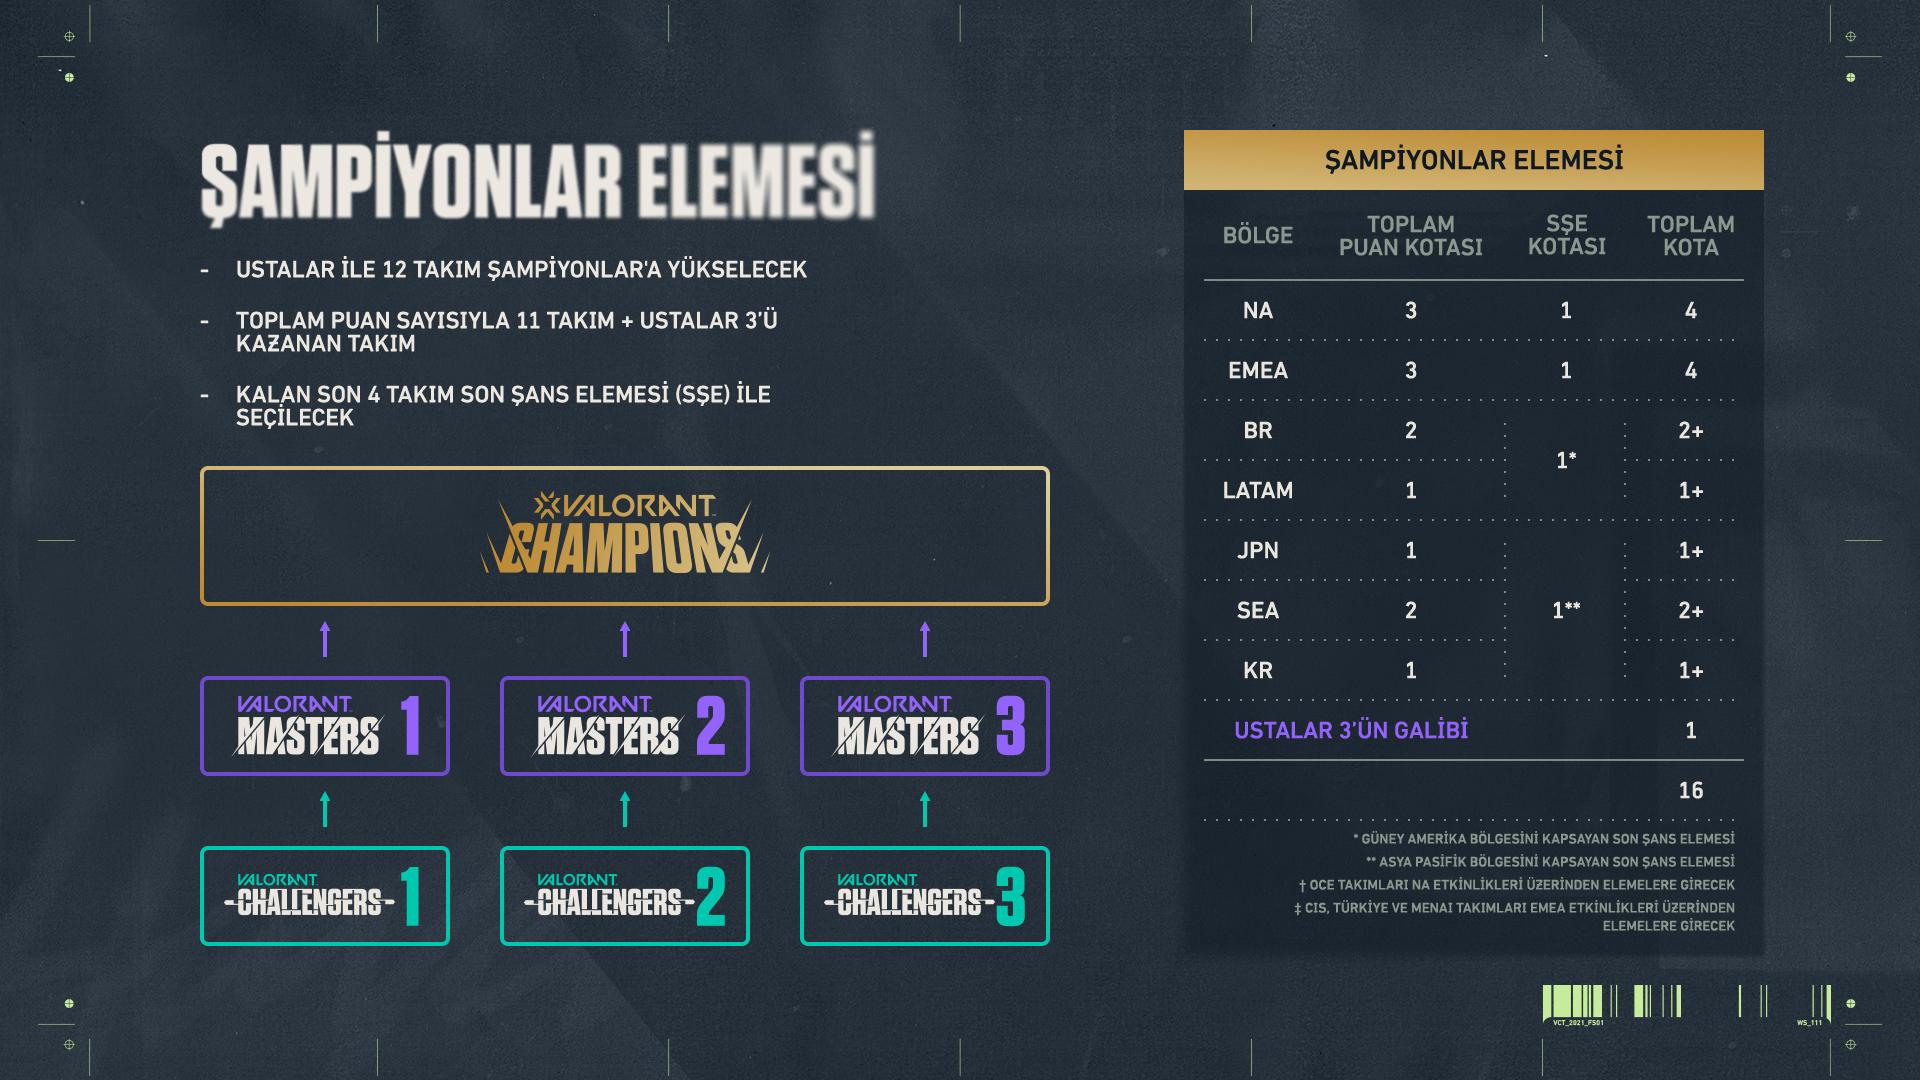 Copy_of_04-championsqualification-v1.0-tur-v2.jpg